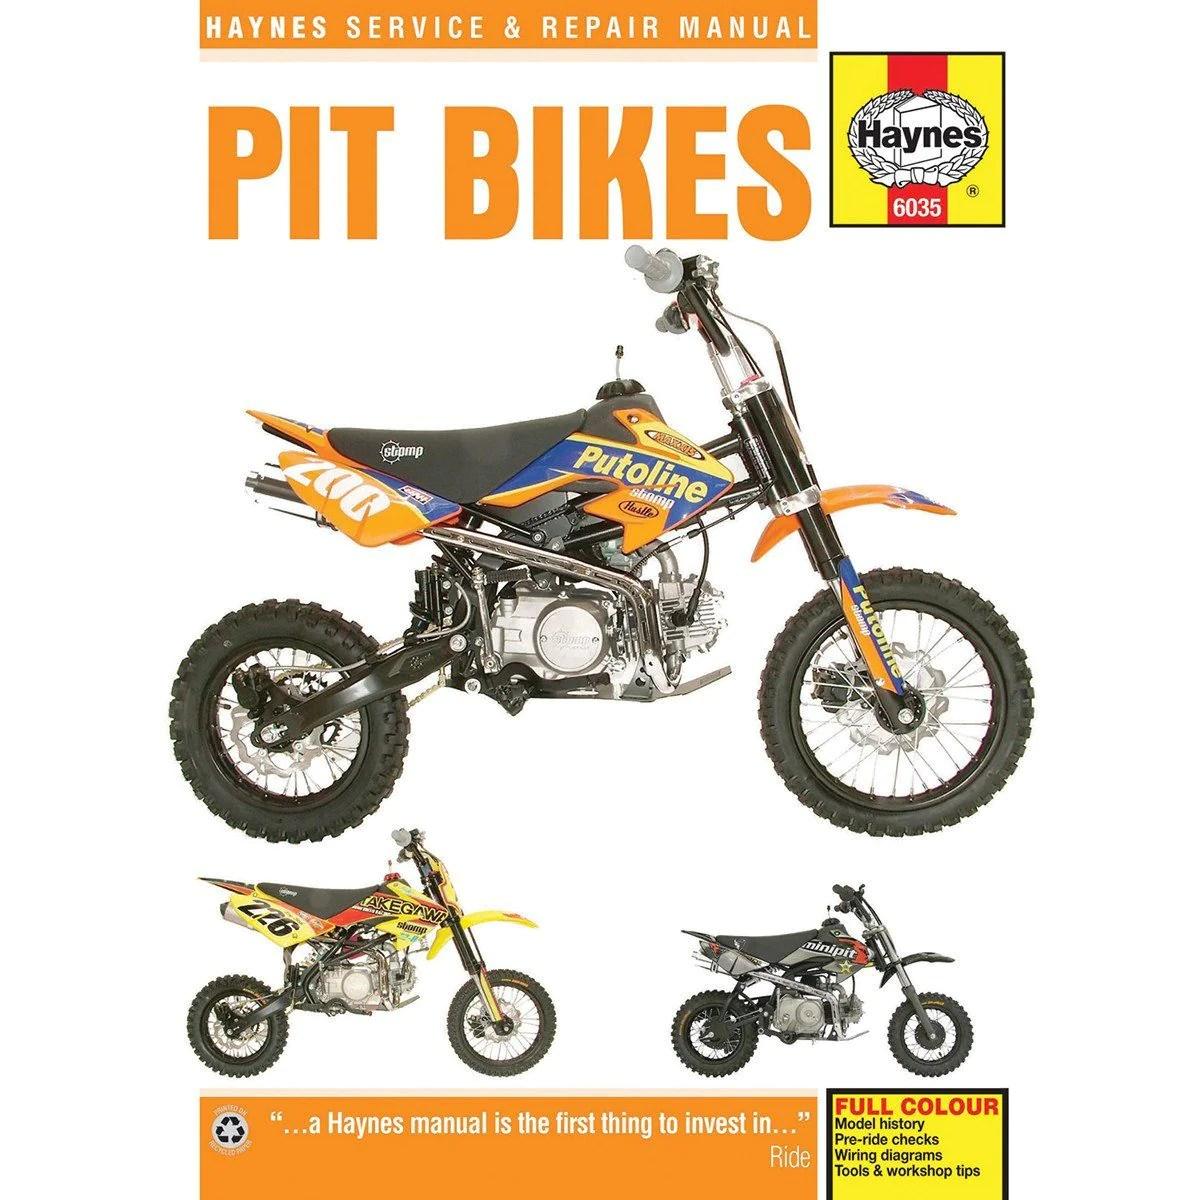 haynes pit bike manual 6035 chinese 4 stroke air cooled horizontal engines [ 1200 x 1200 Pixel ]